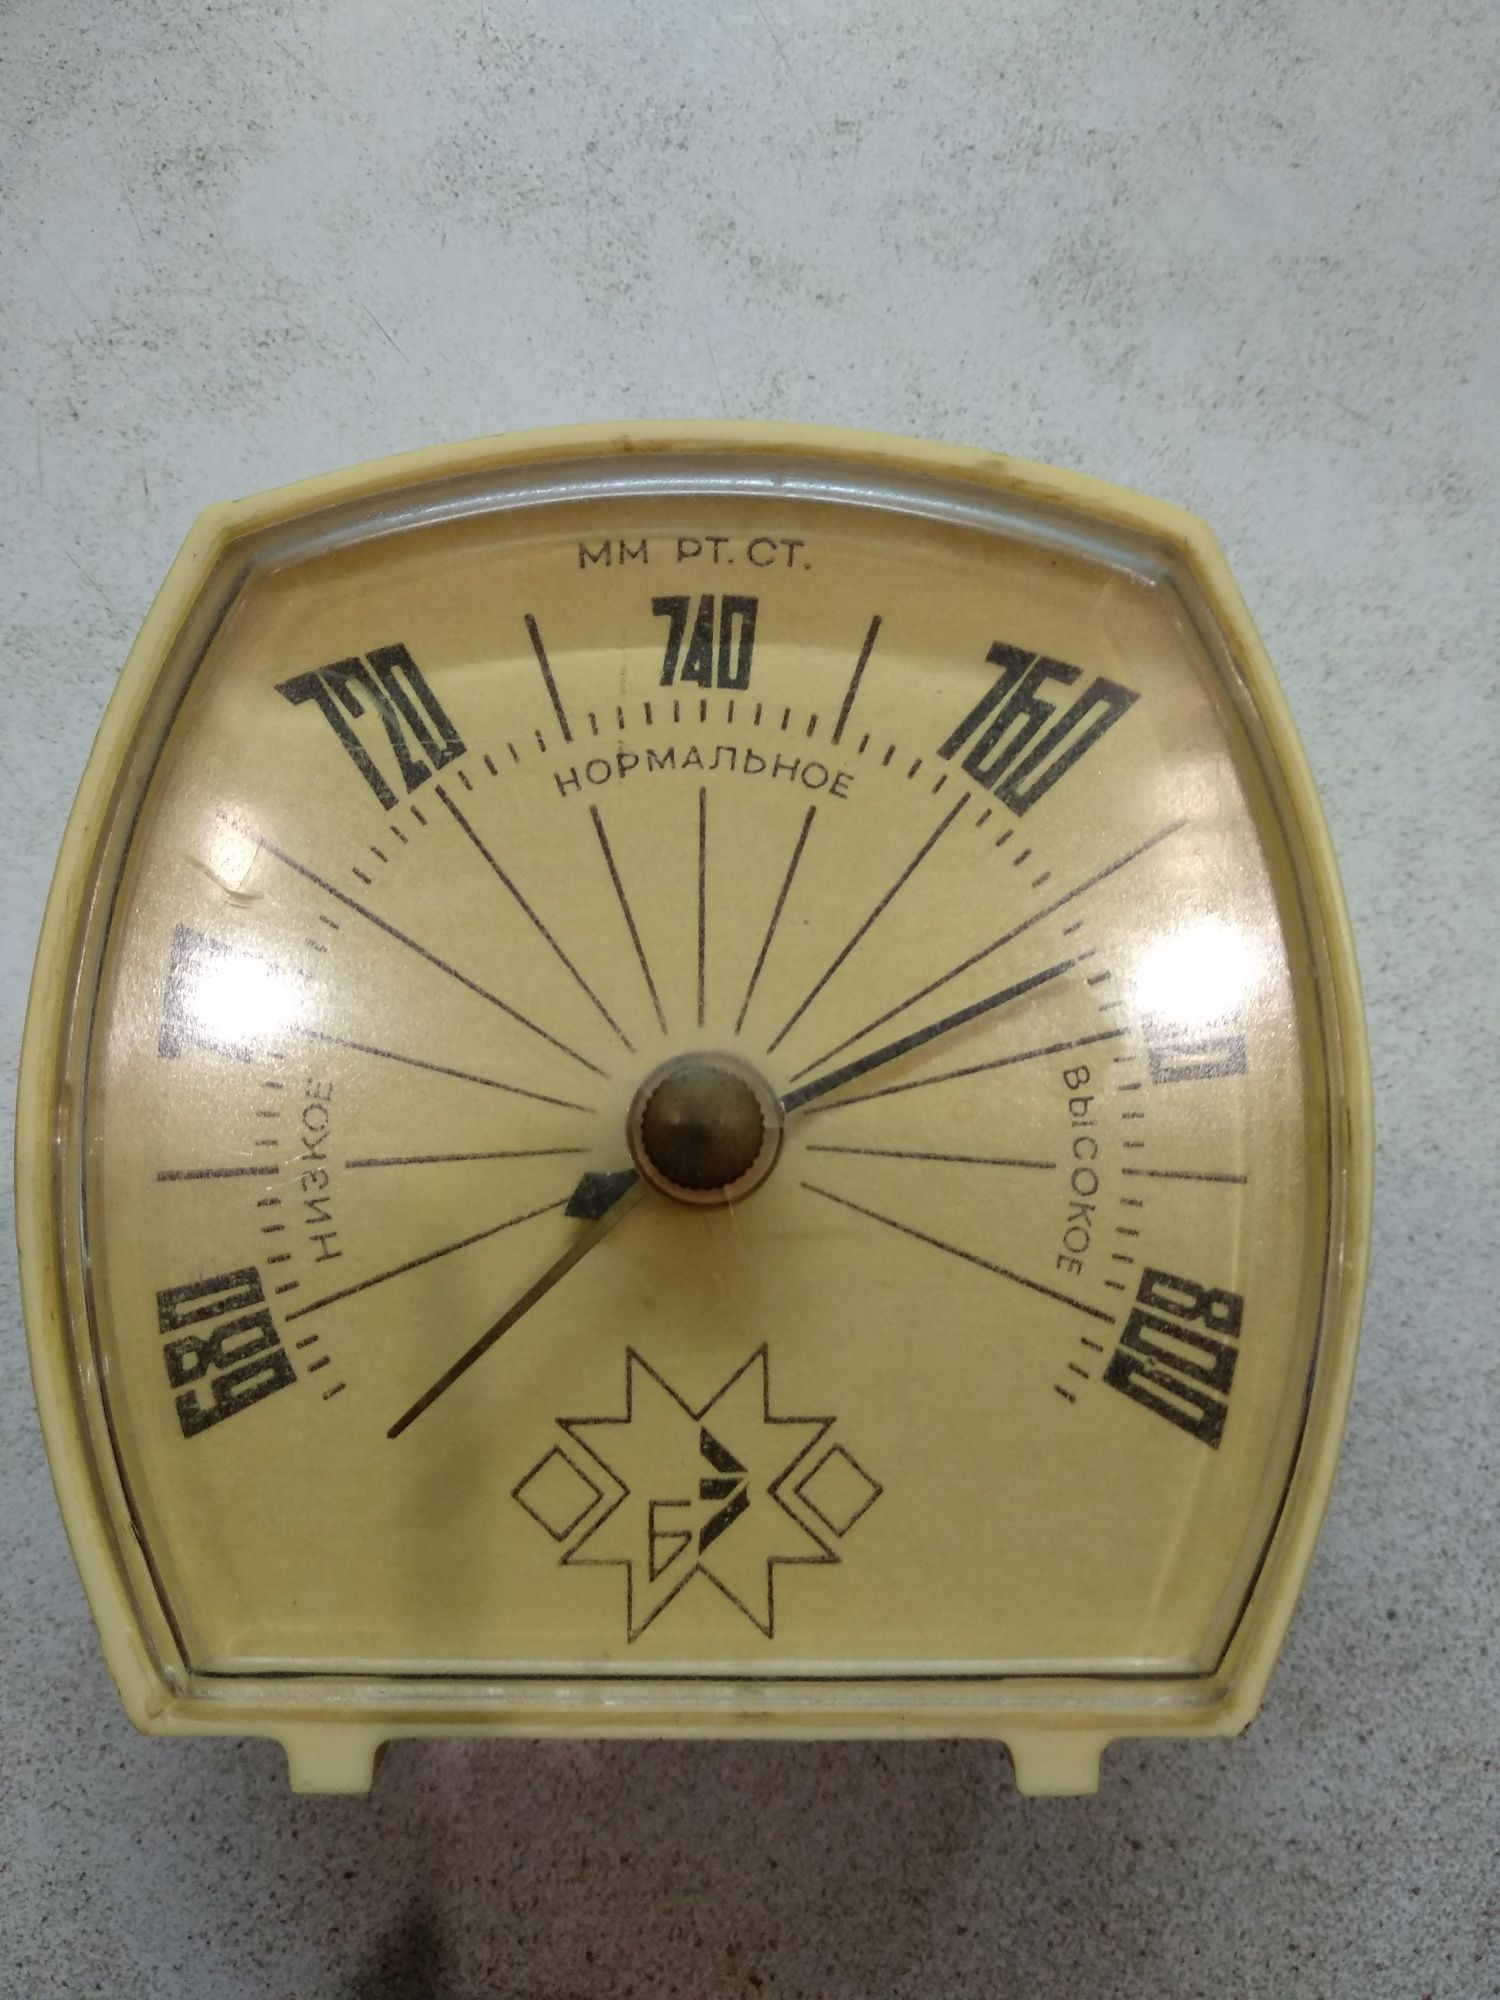 Продам барометр СССР